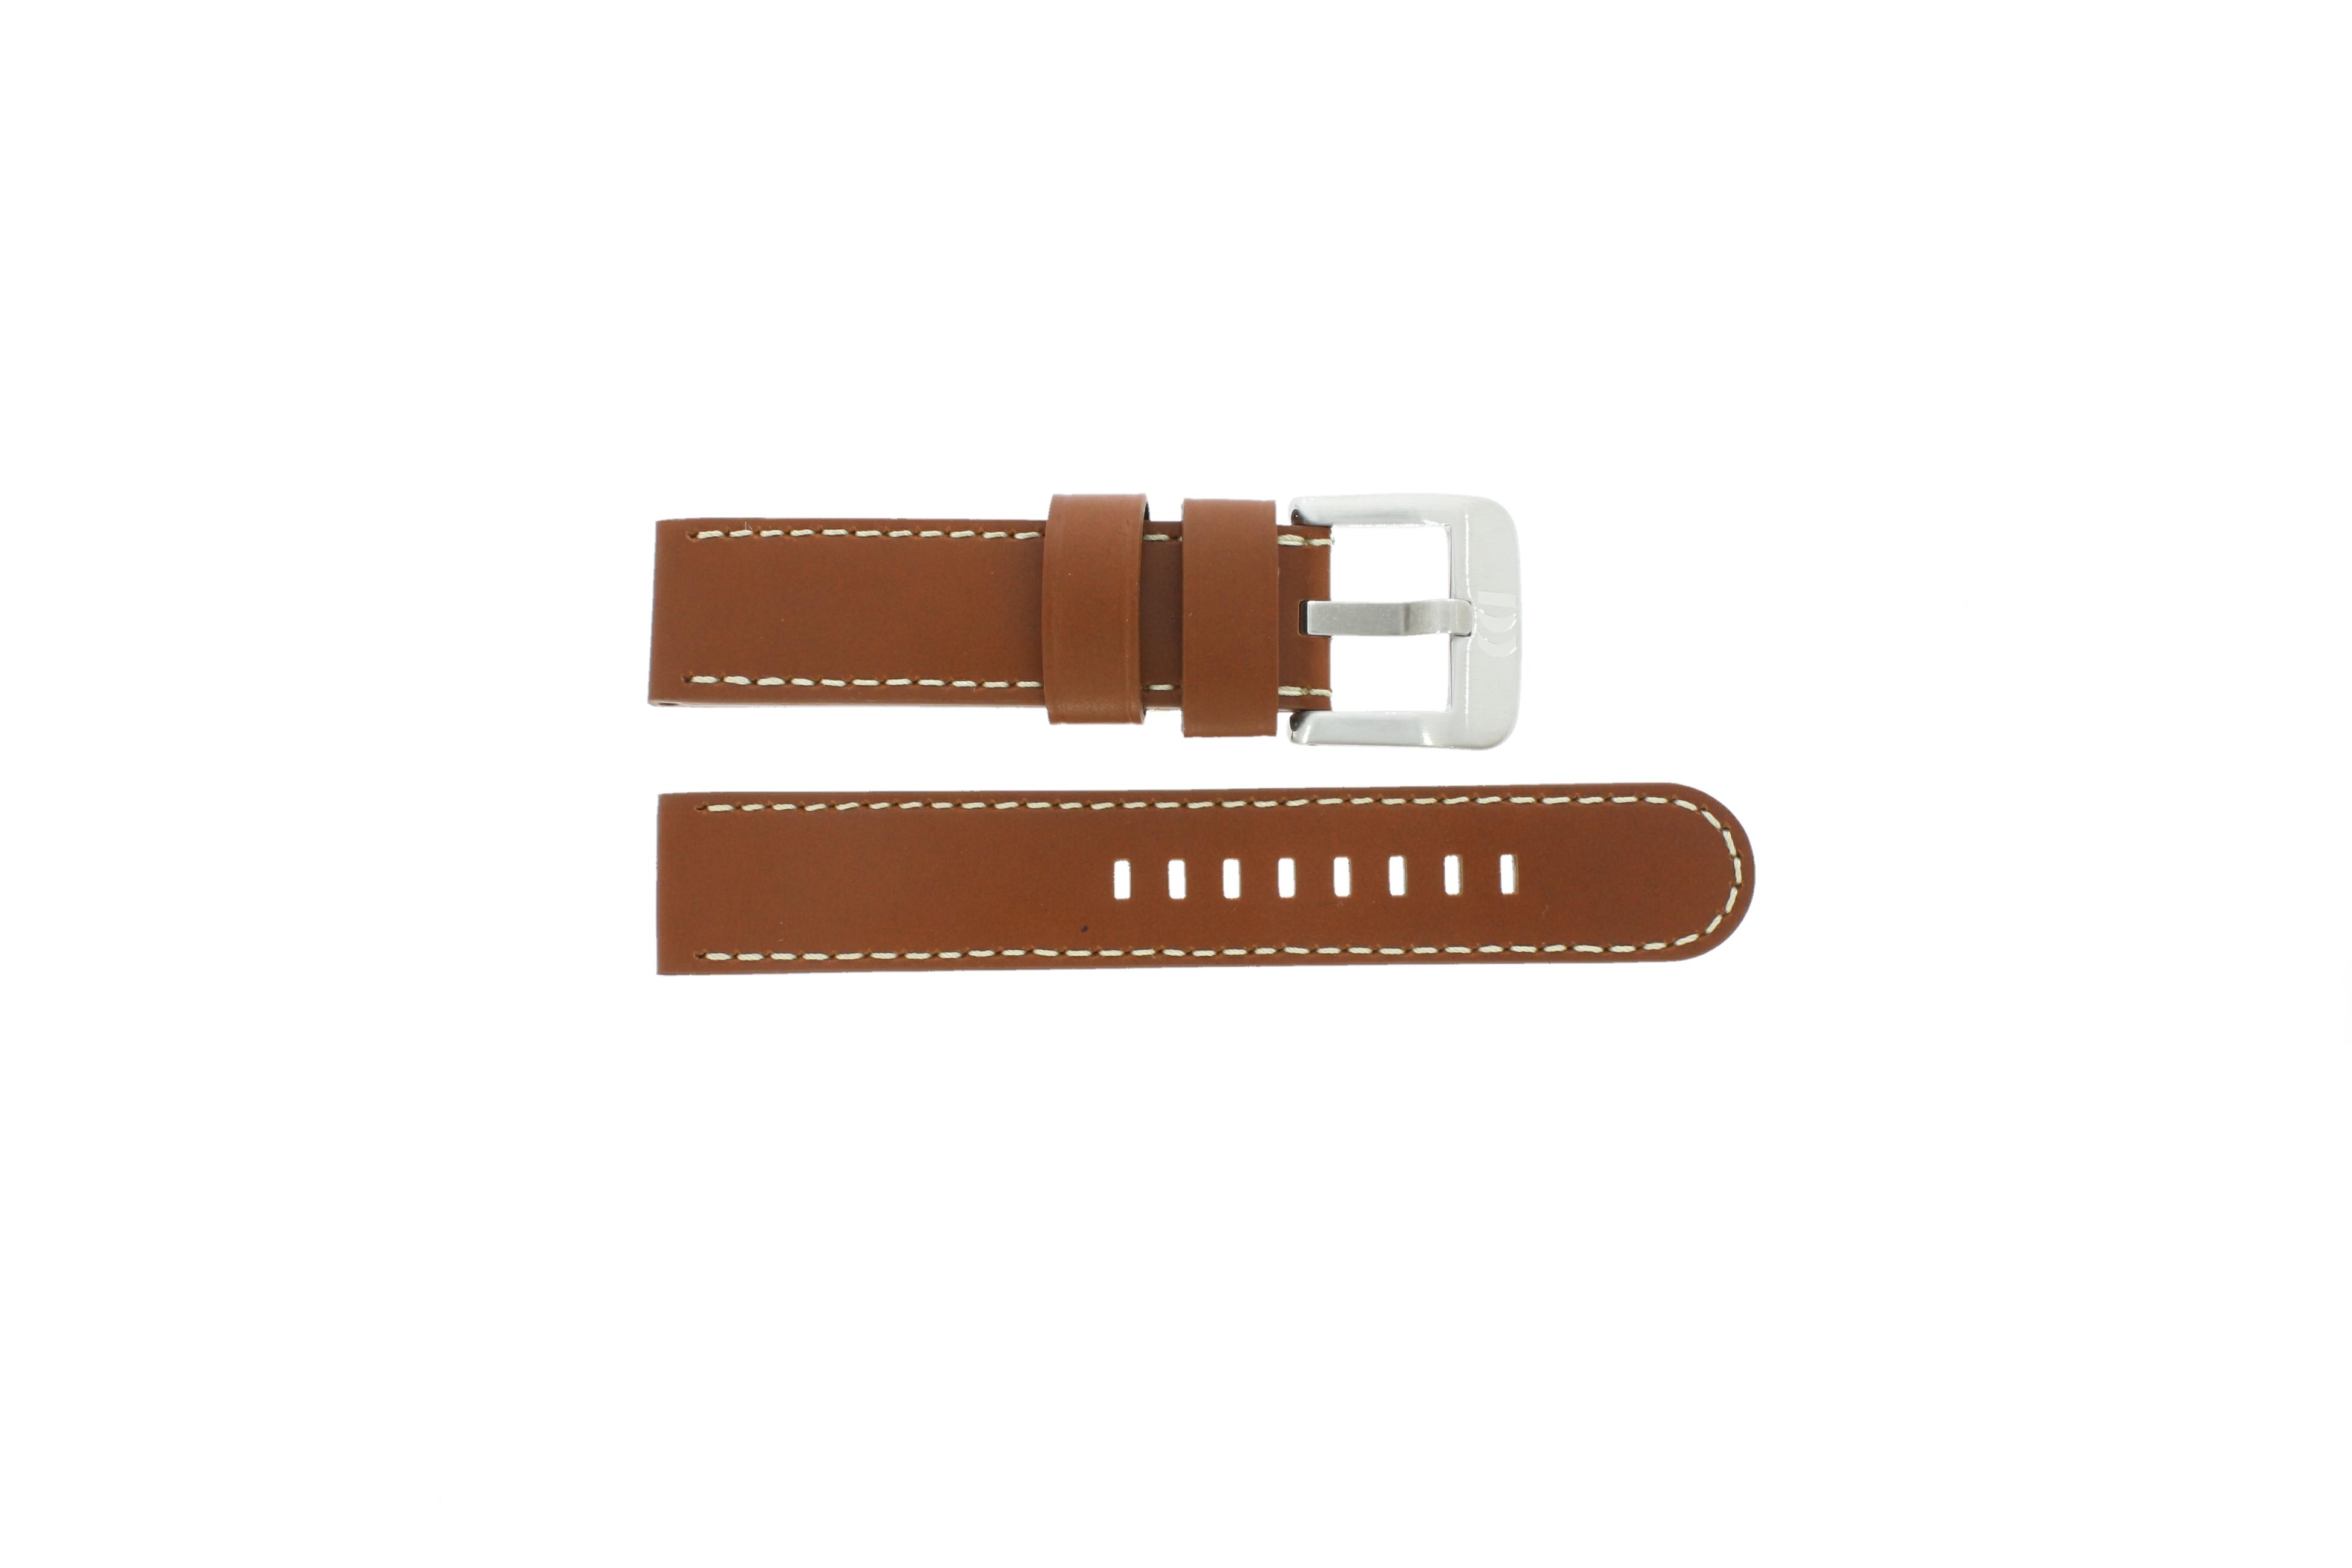 Danish Design klockarmband IQ12Q712 Läder Brun 20mm